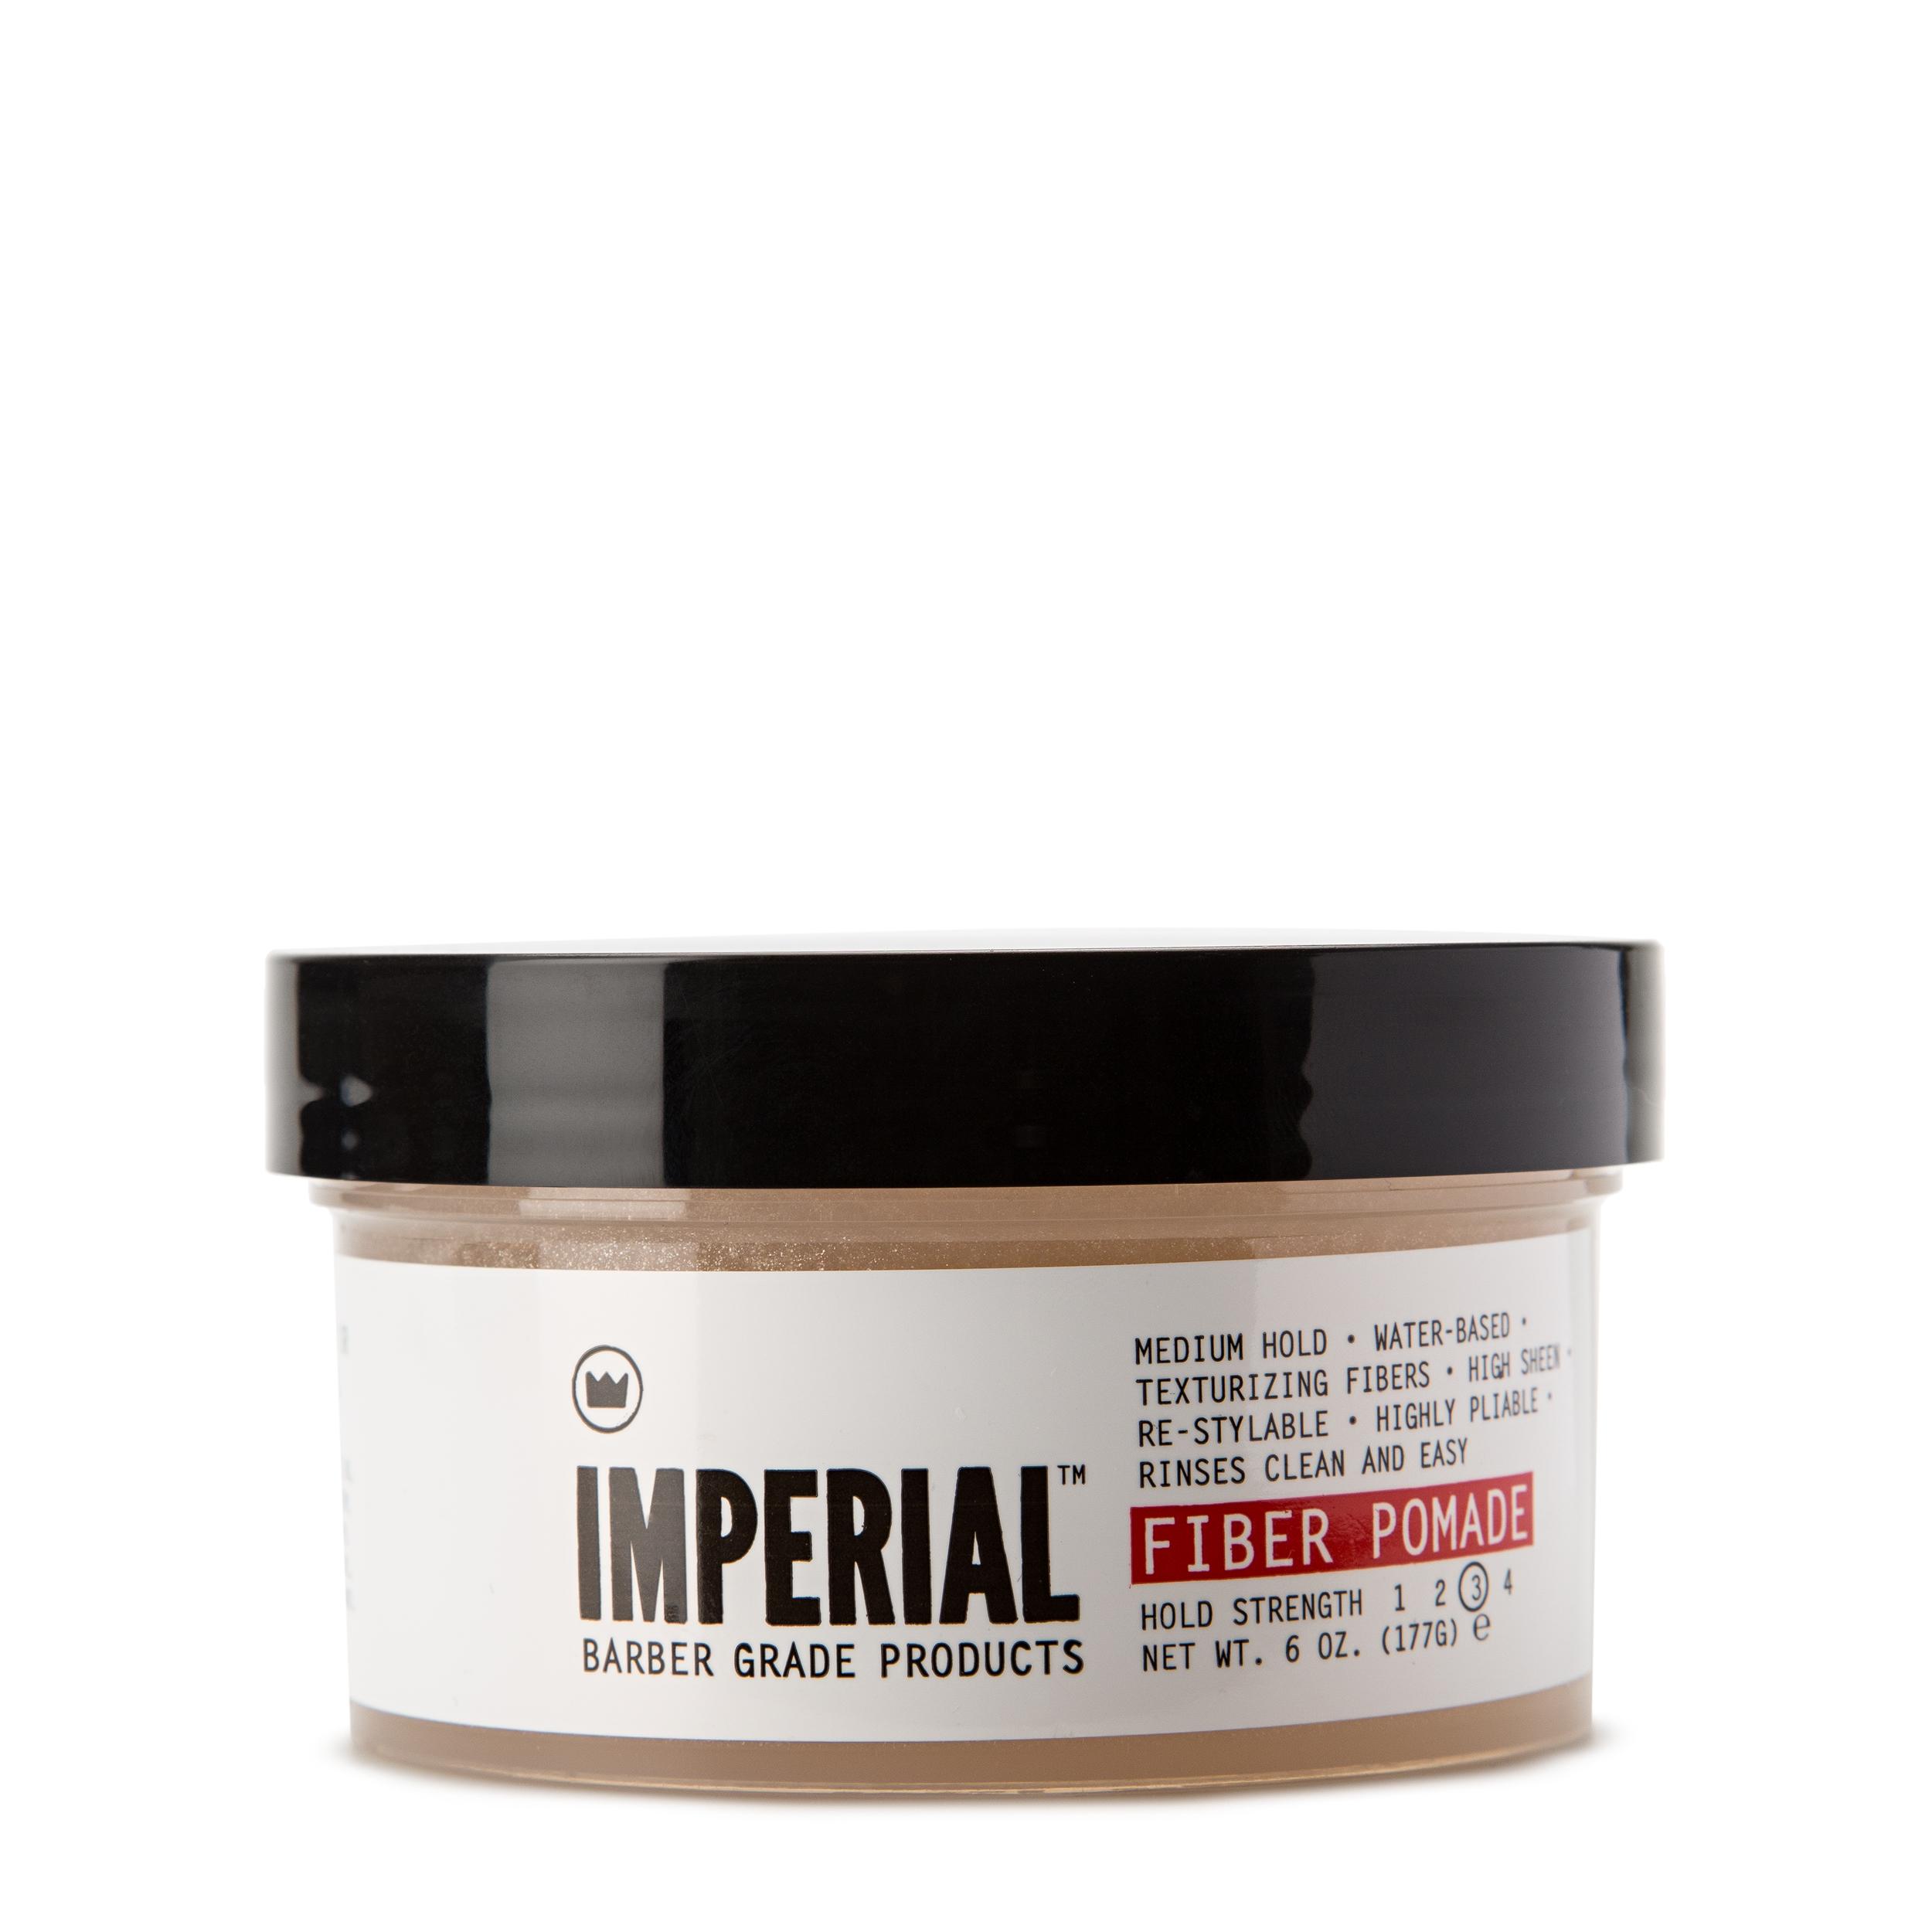 Imperial Barber Средство для укладки волос Fiber Pomade 177 гр фото